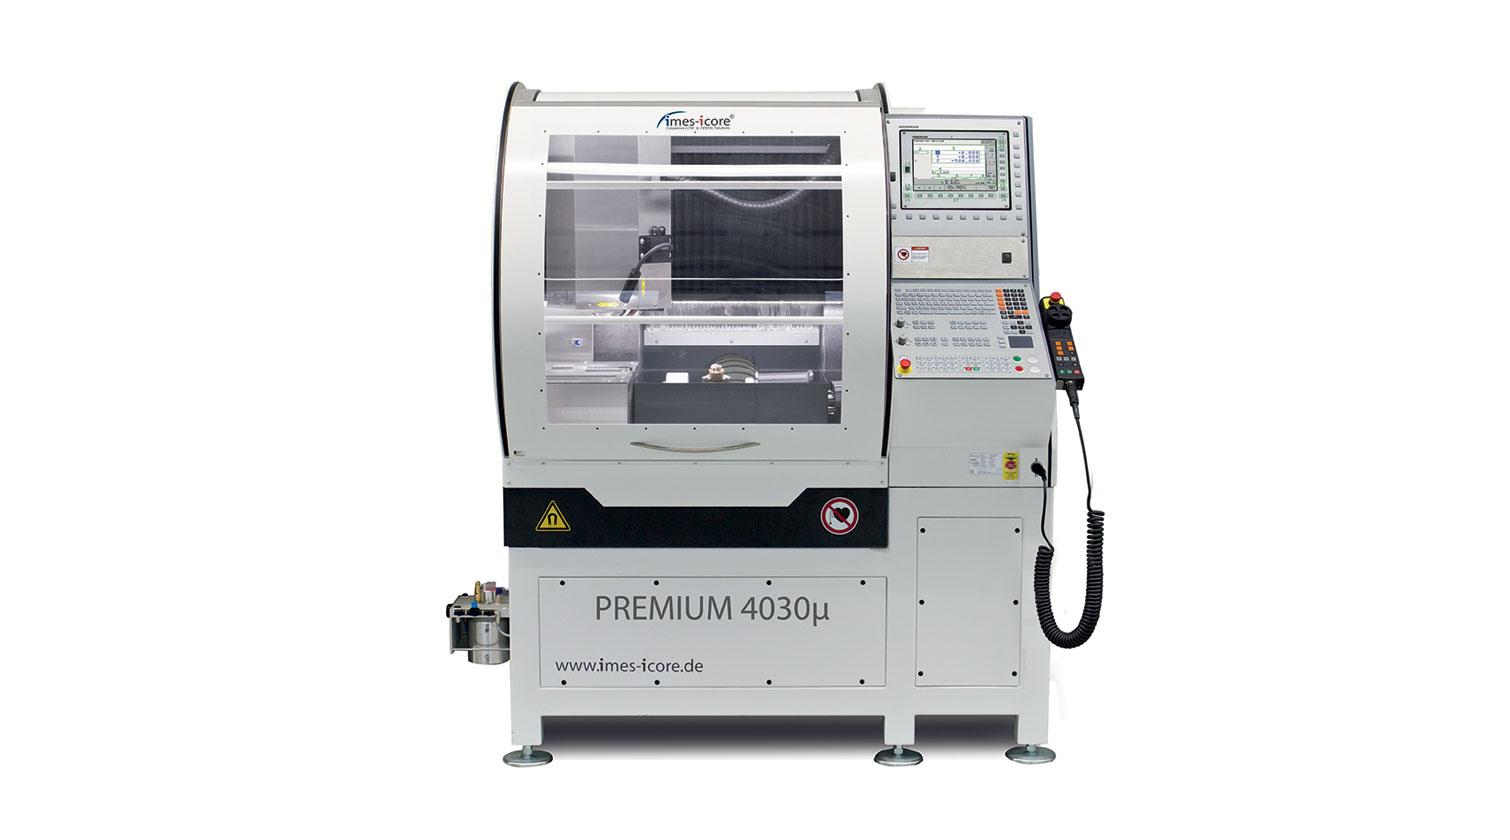 INT micro milling rapid prototyping CNC Imes Icore Premium 4030µ